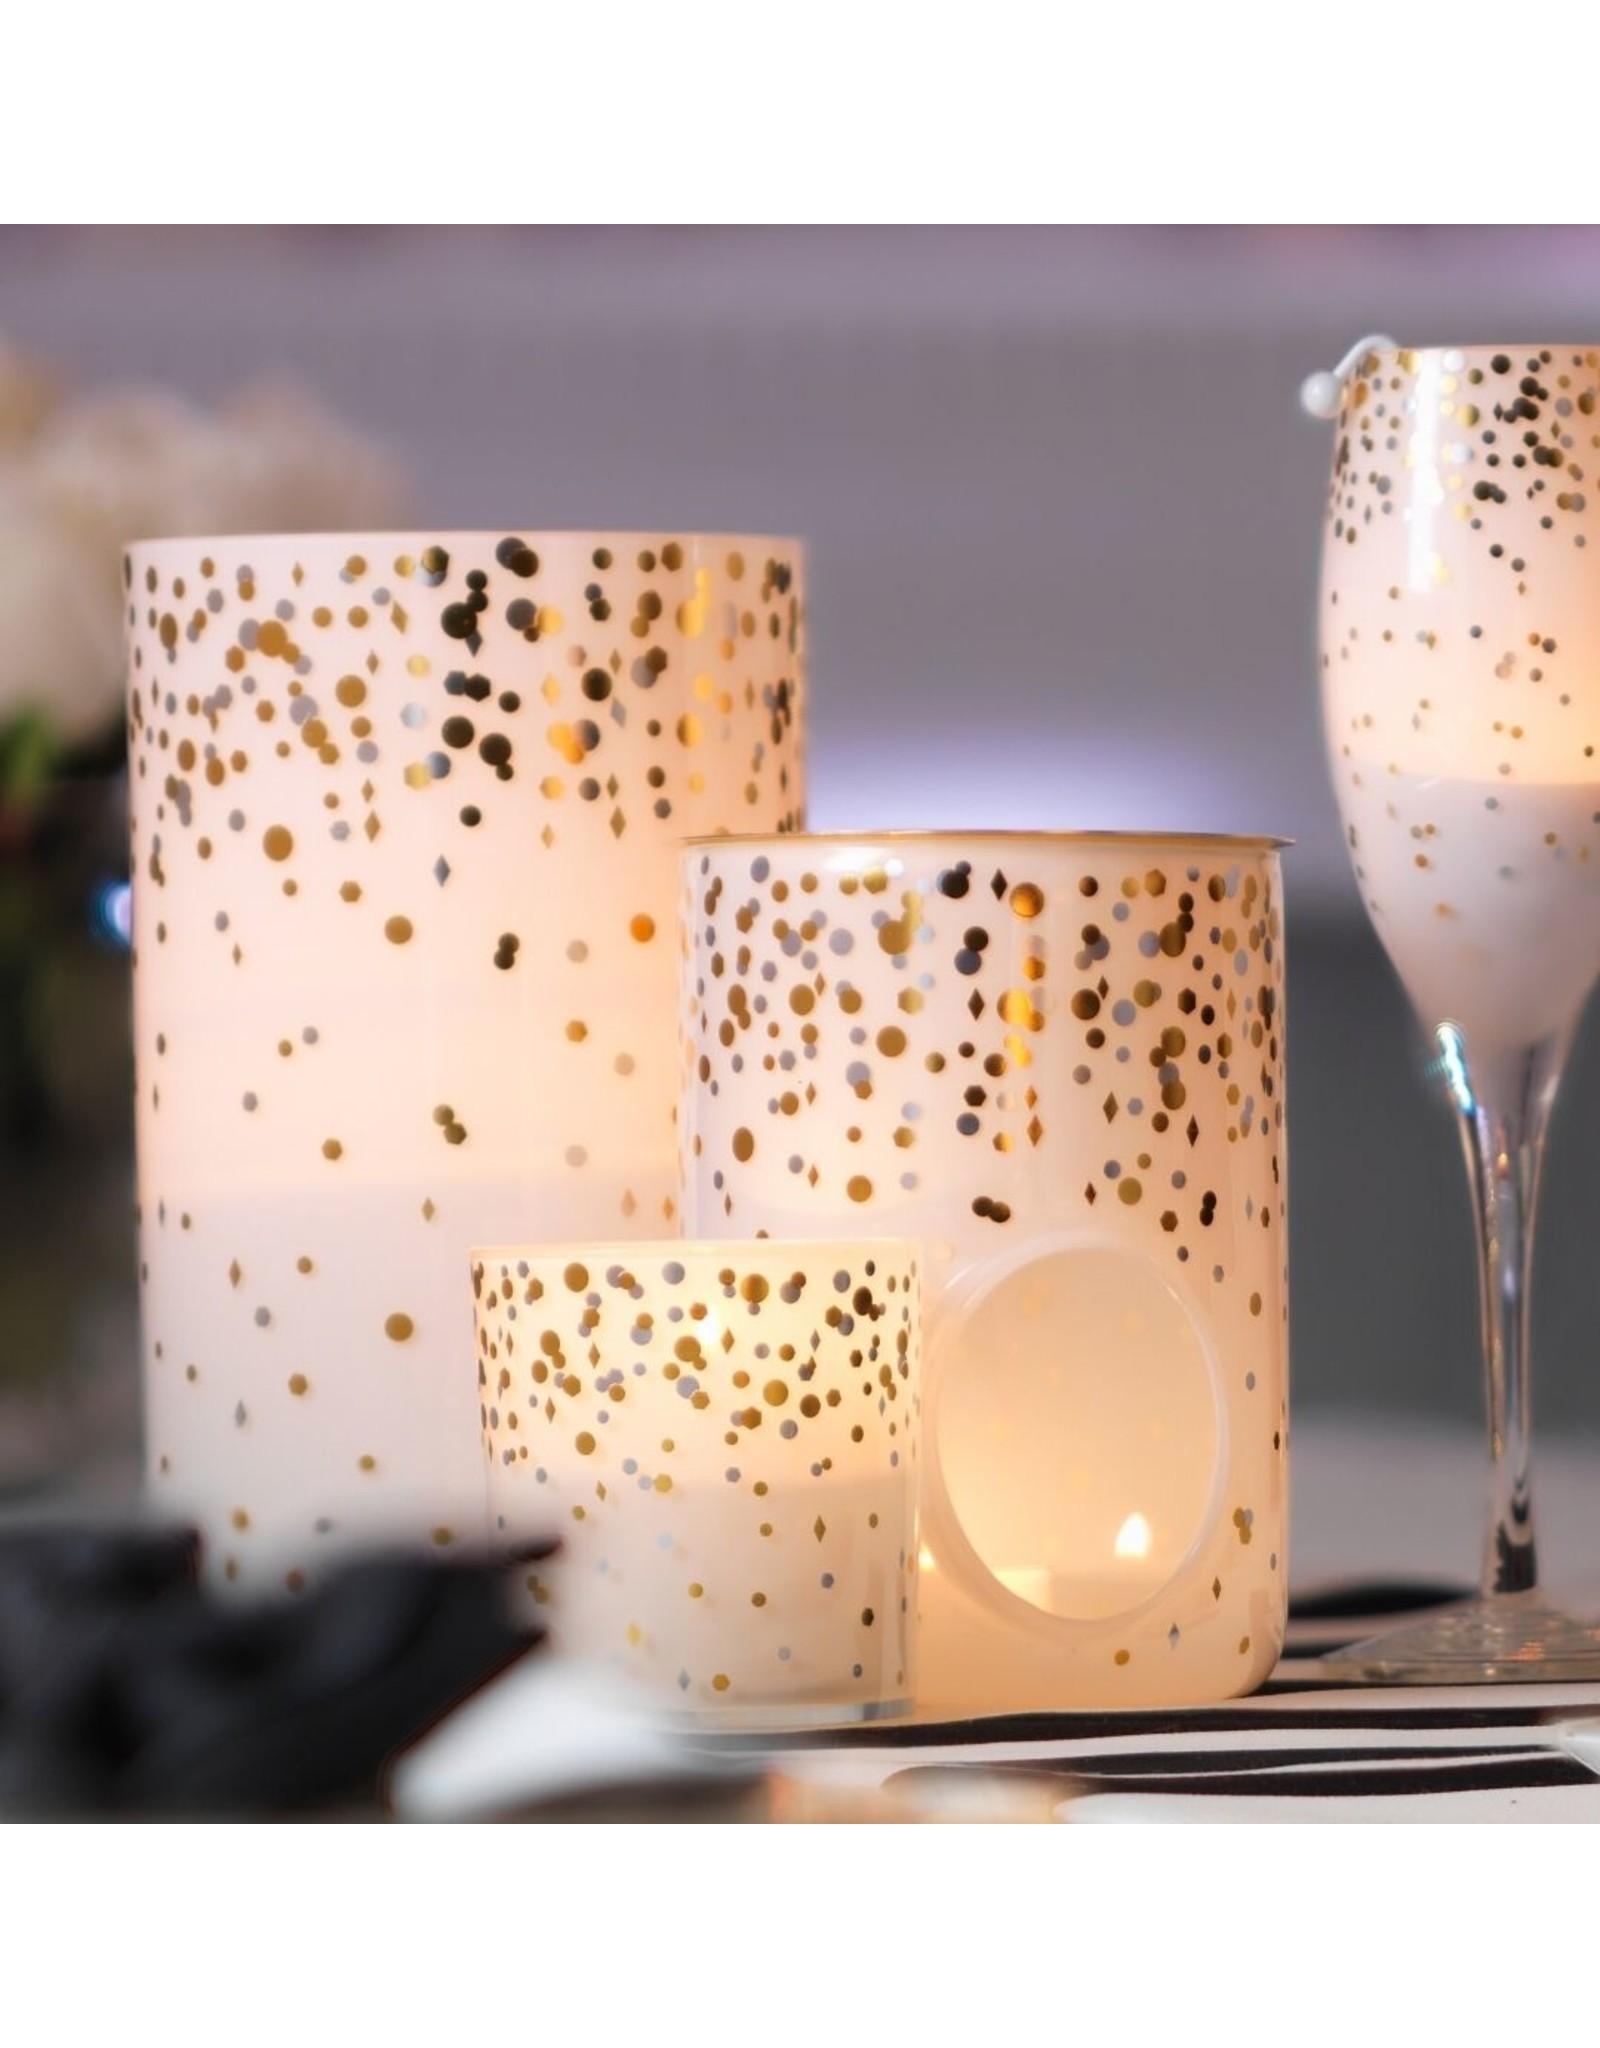 Yankee Candle Holiday Party - Melt Warmer / Geurverspreider